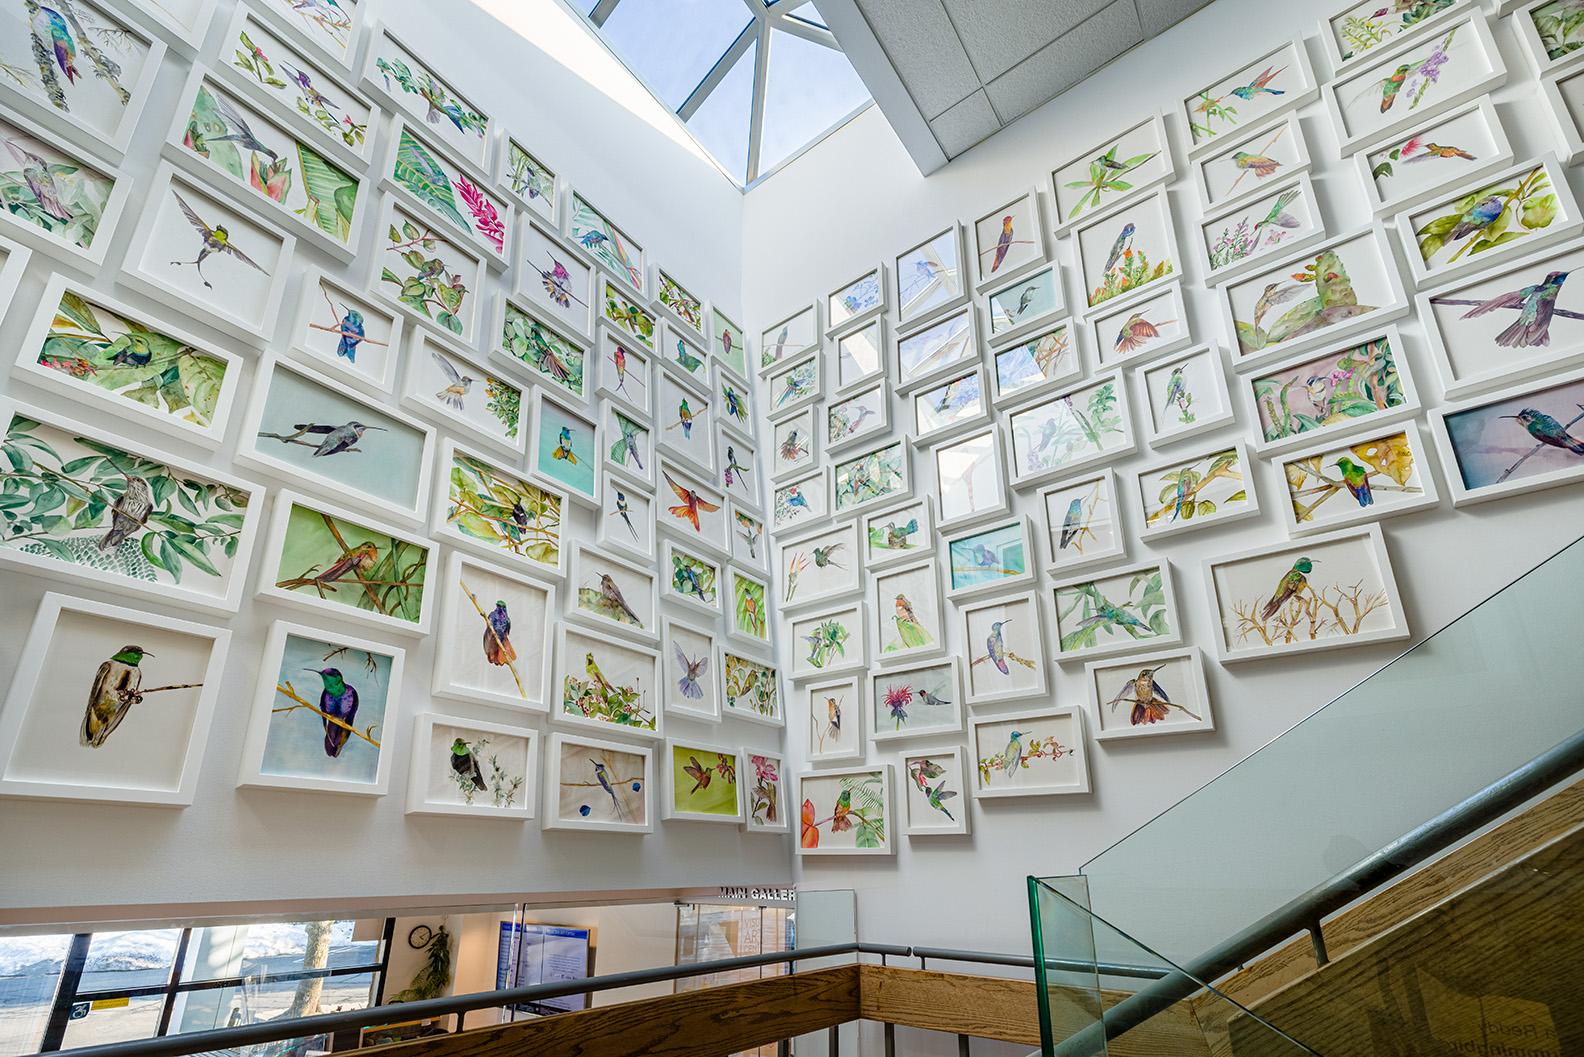 Installation view of 108 Hummingbirds